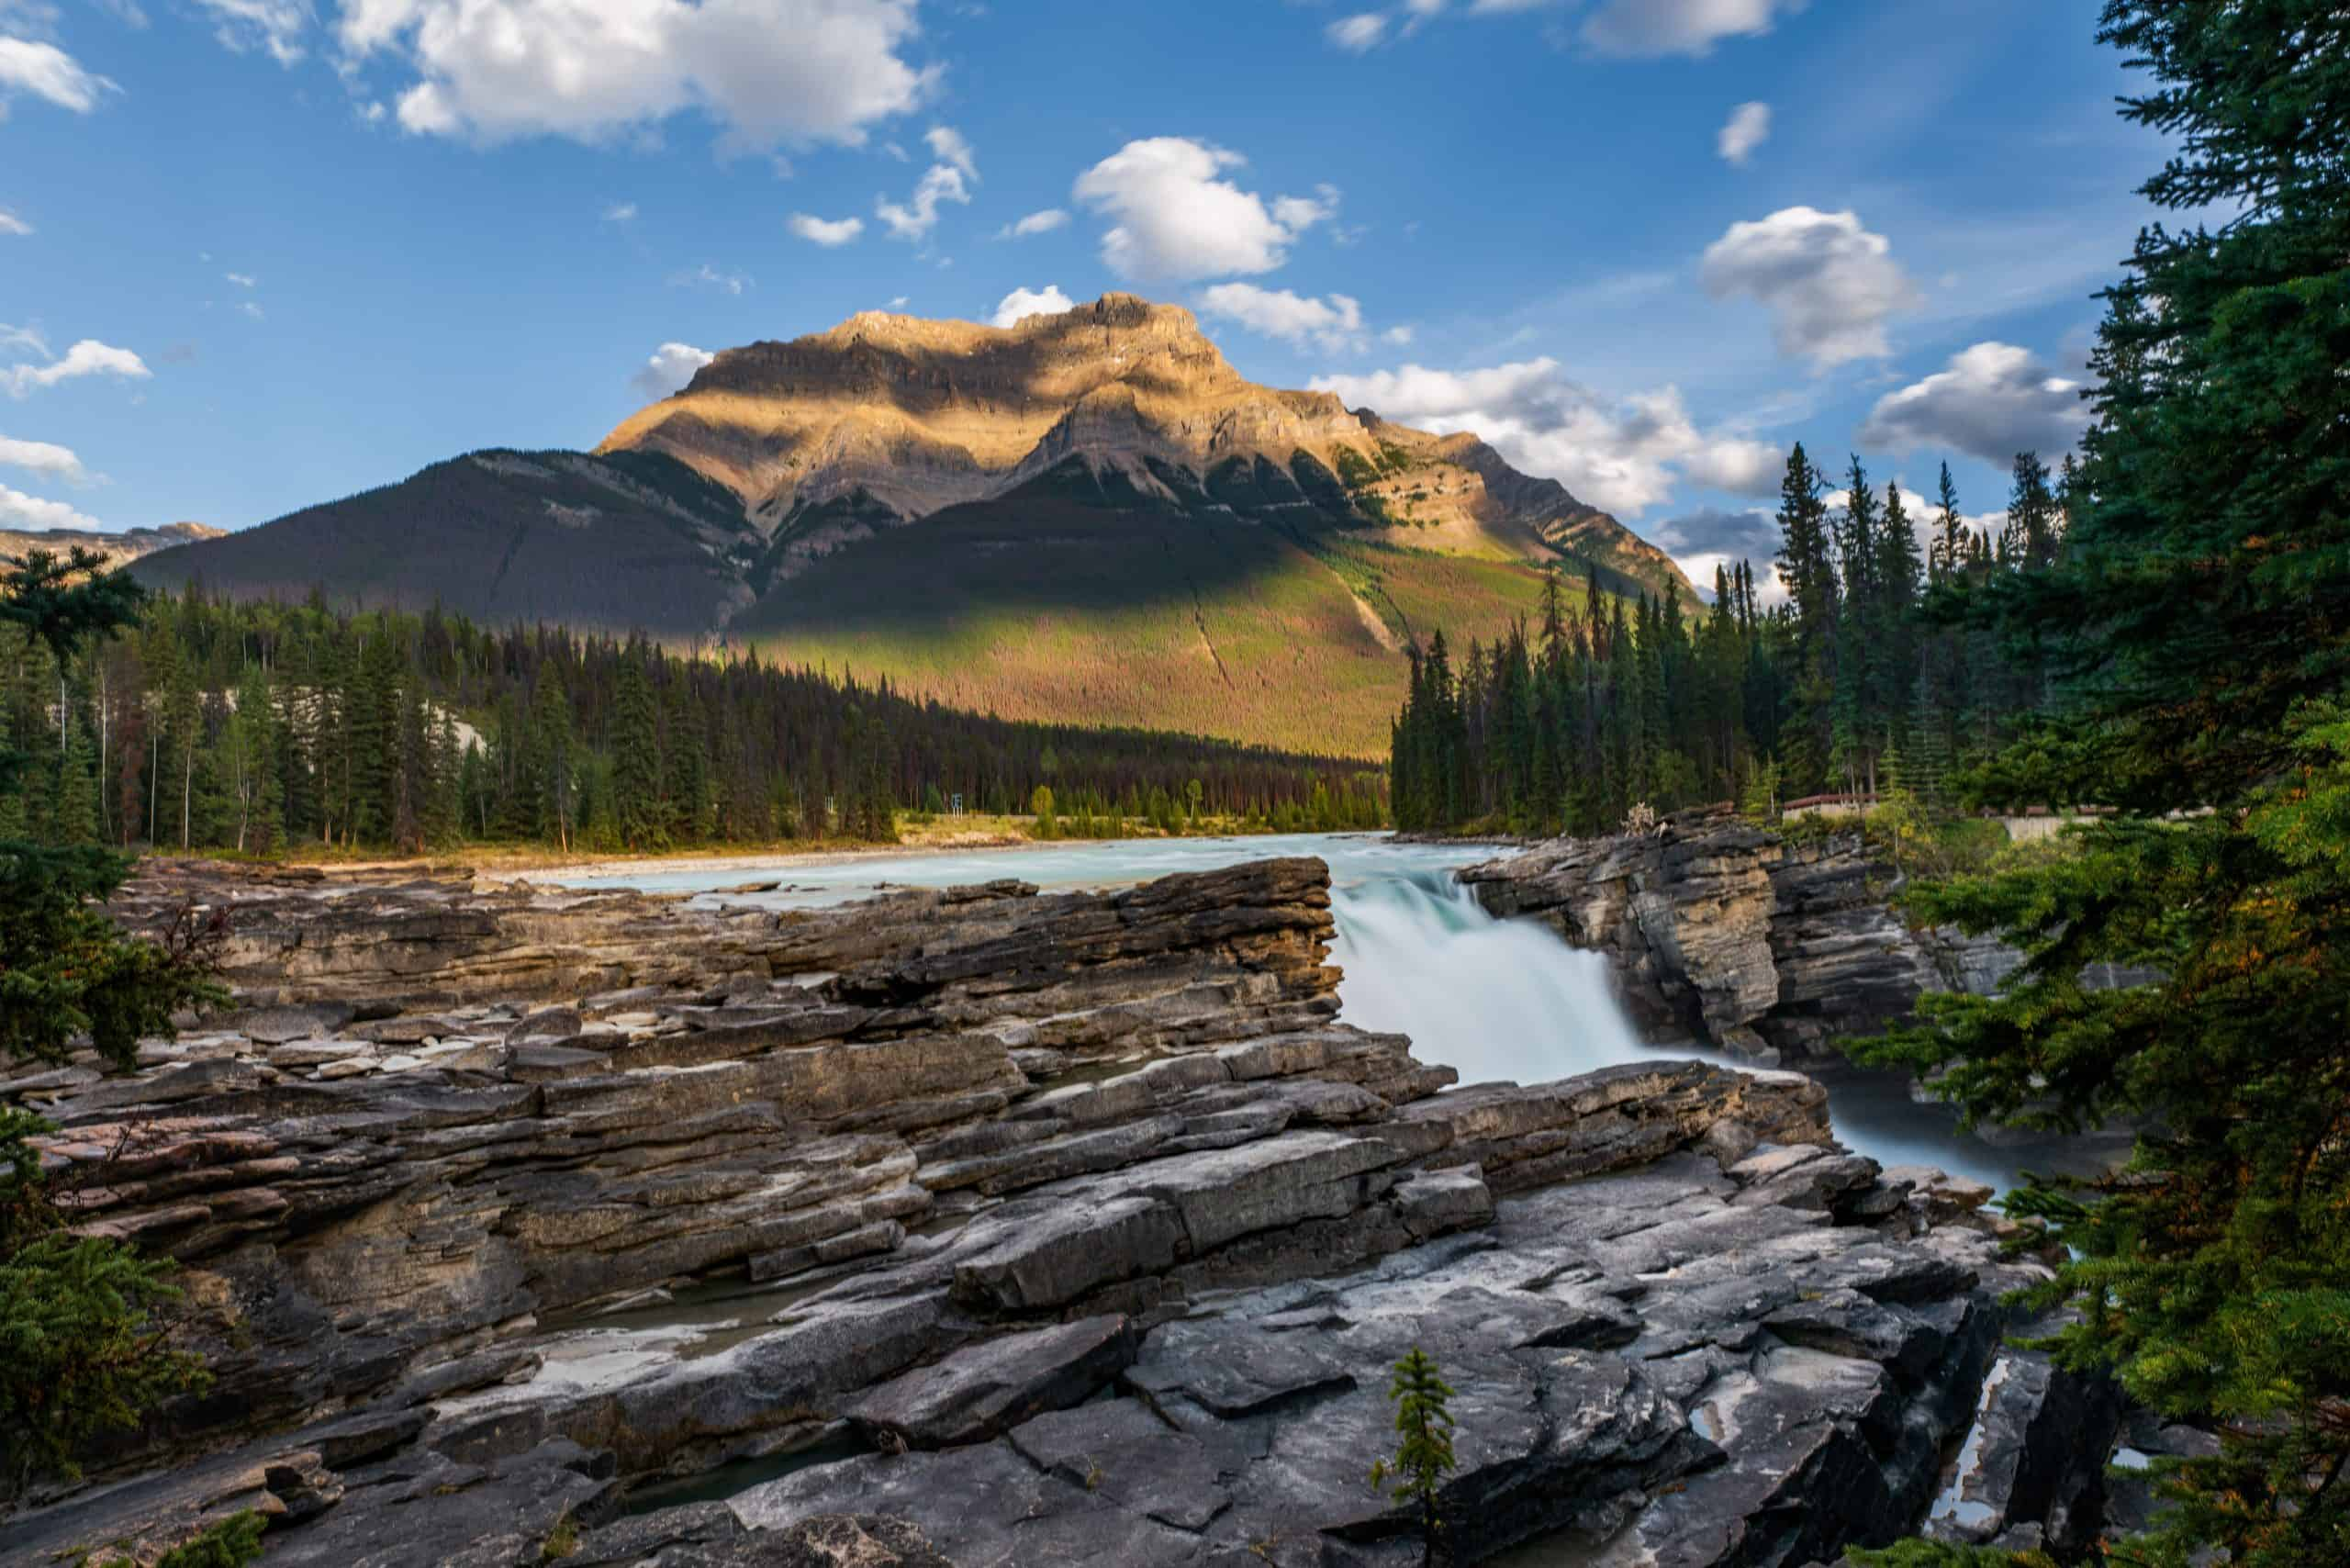 Canadian nature